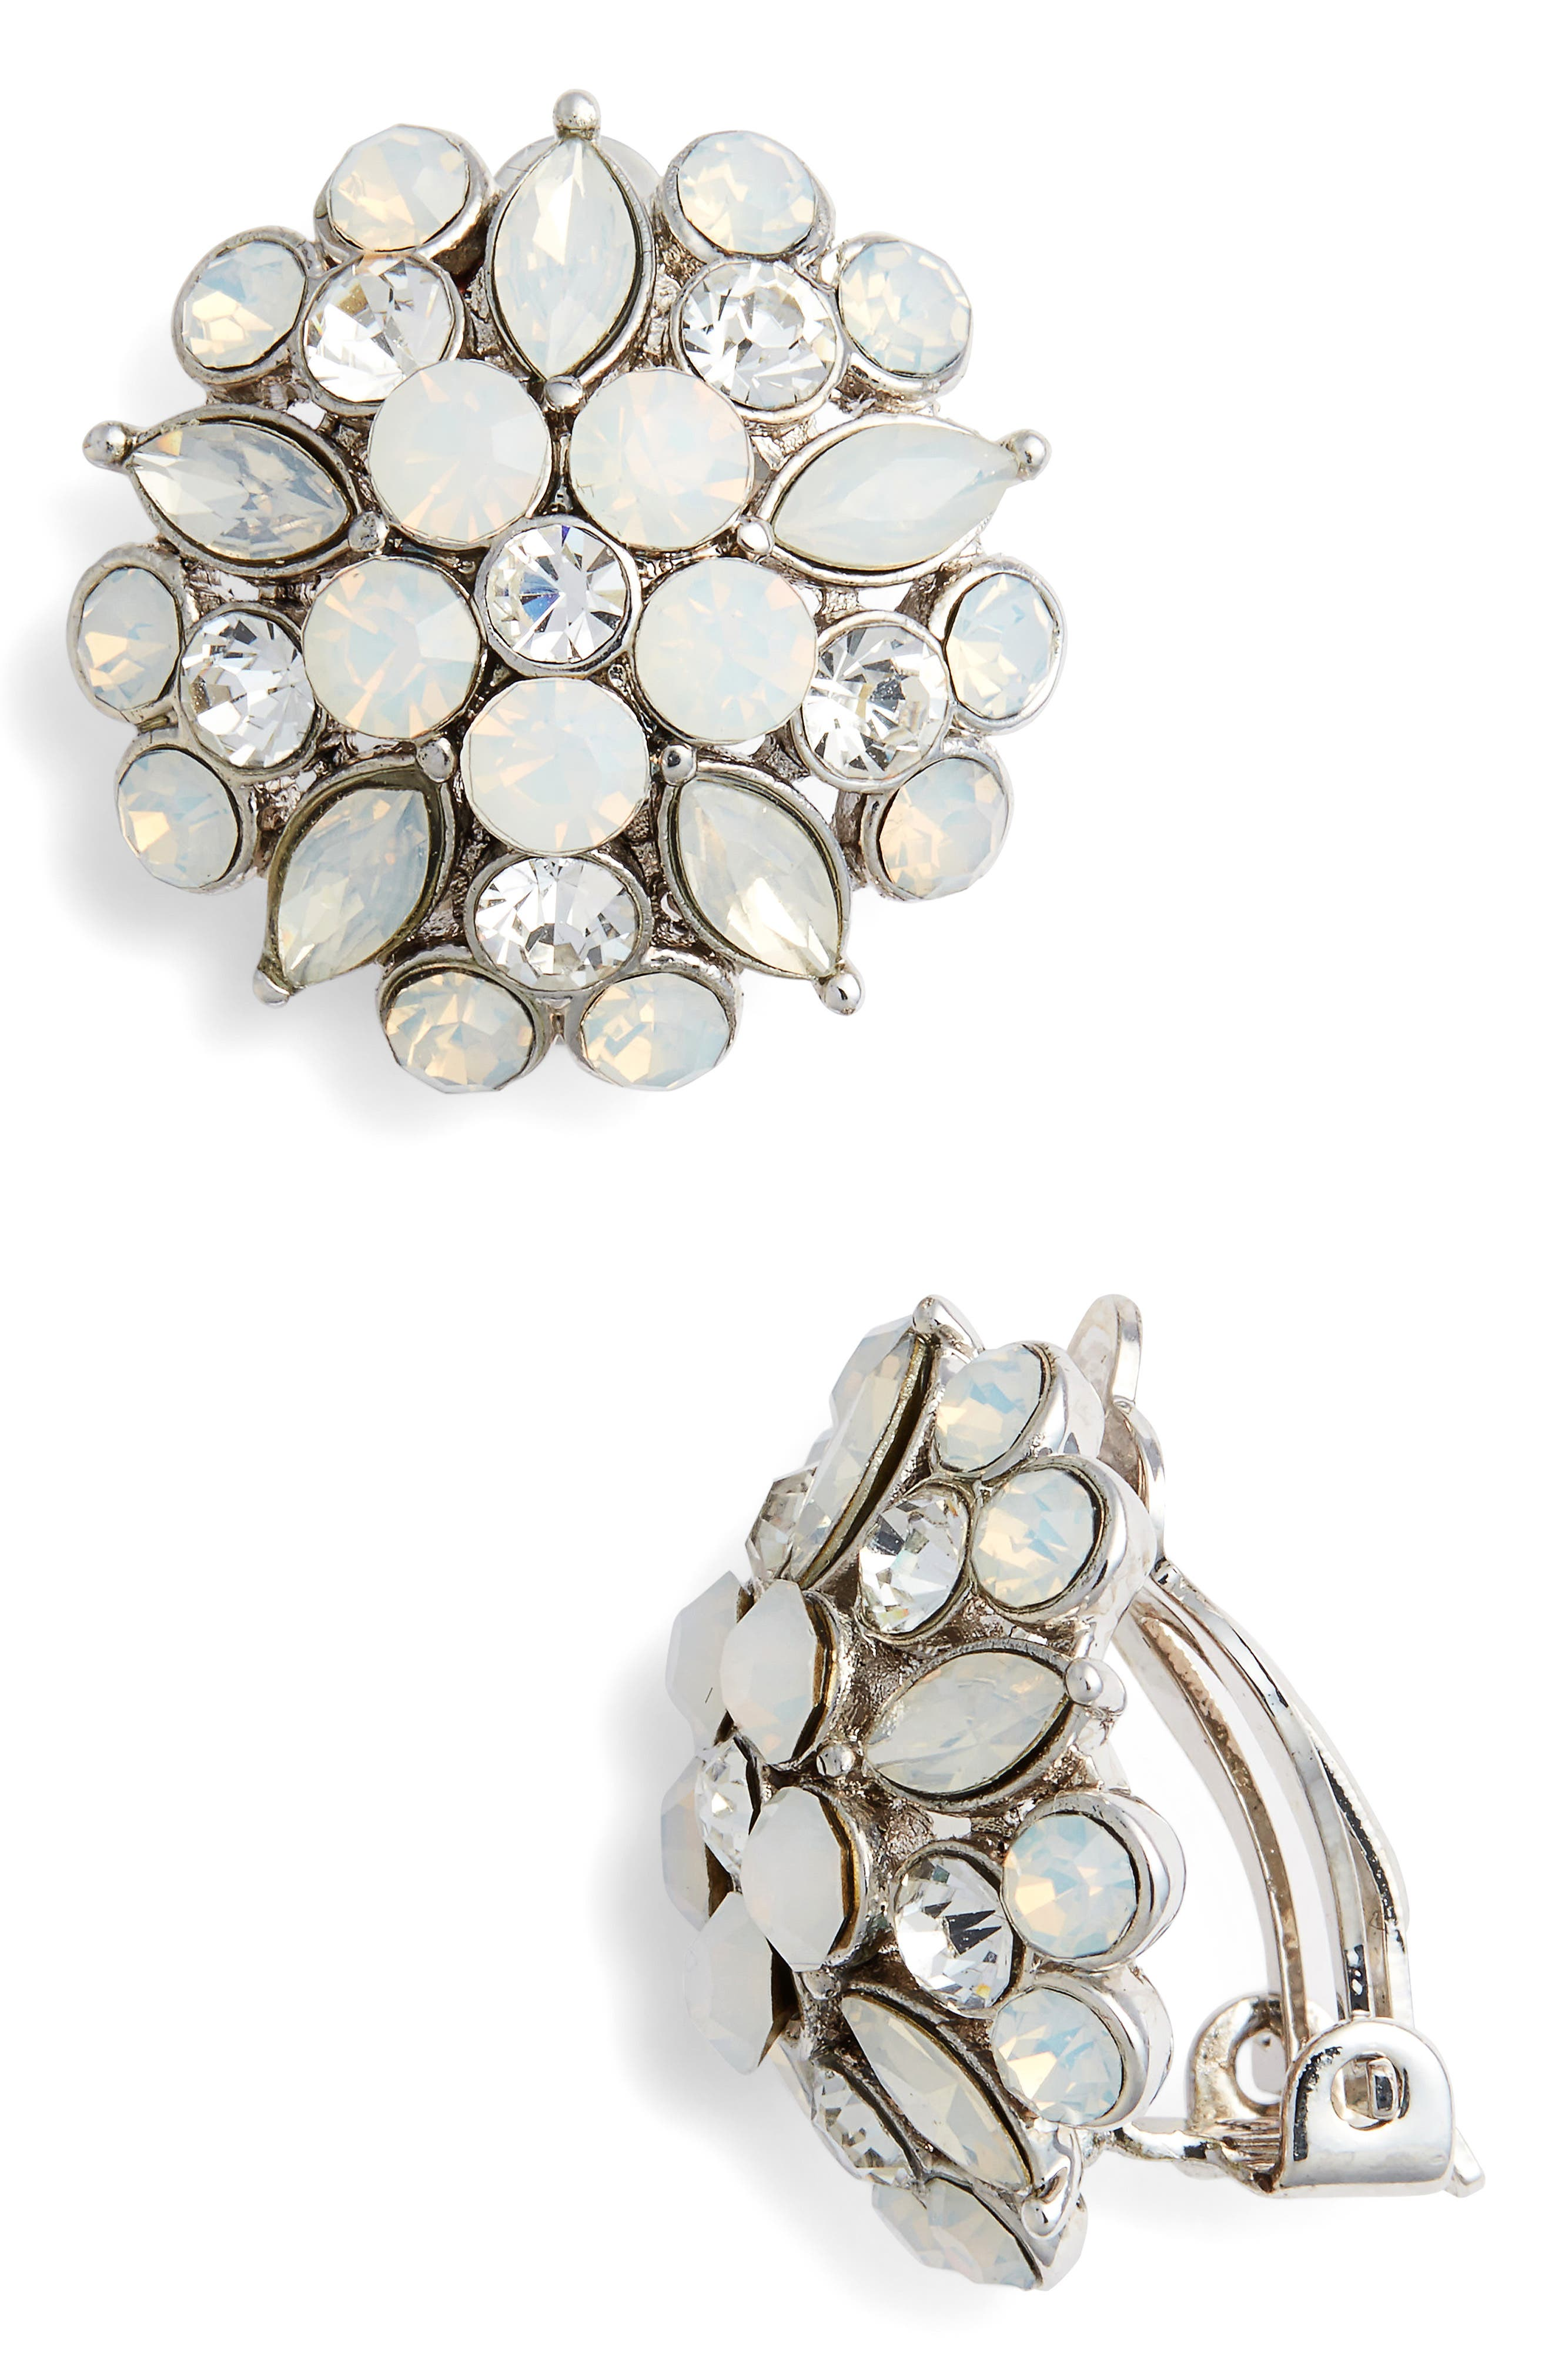 NINA, Floral Stud Earrings, Main thumbnail 1, color, SILVER/ OPAL/ WHITE CRYSTAL